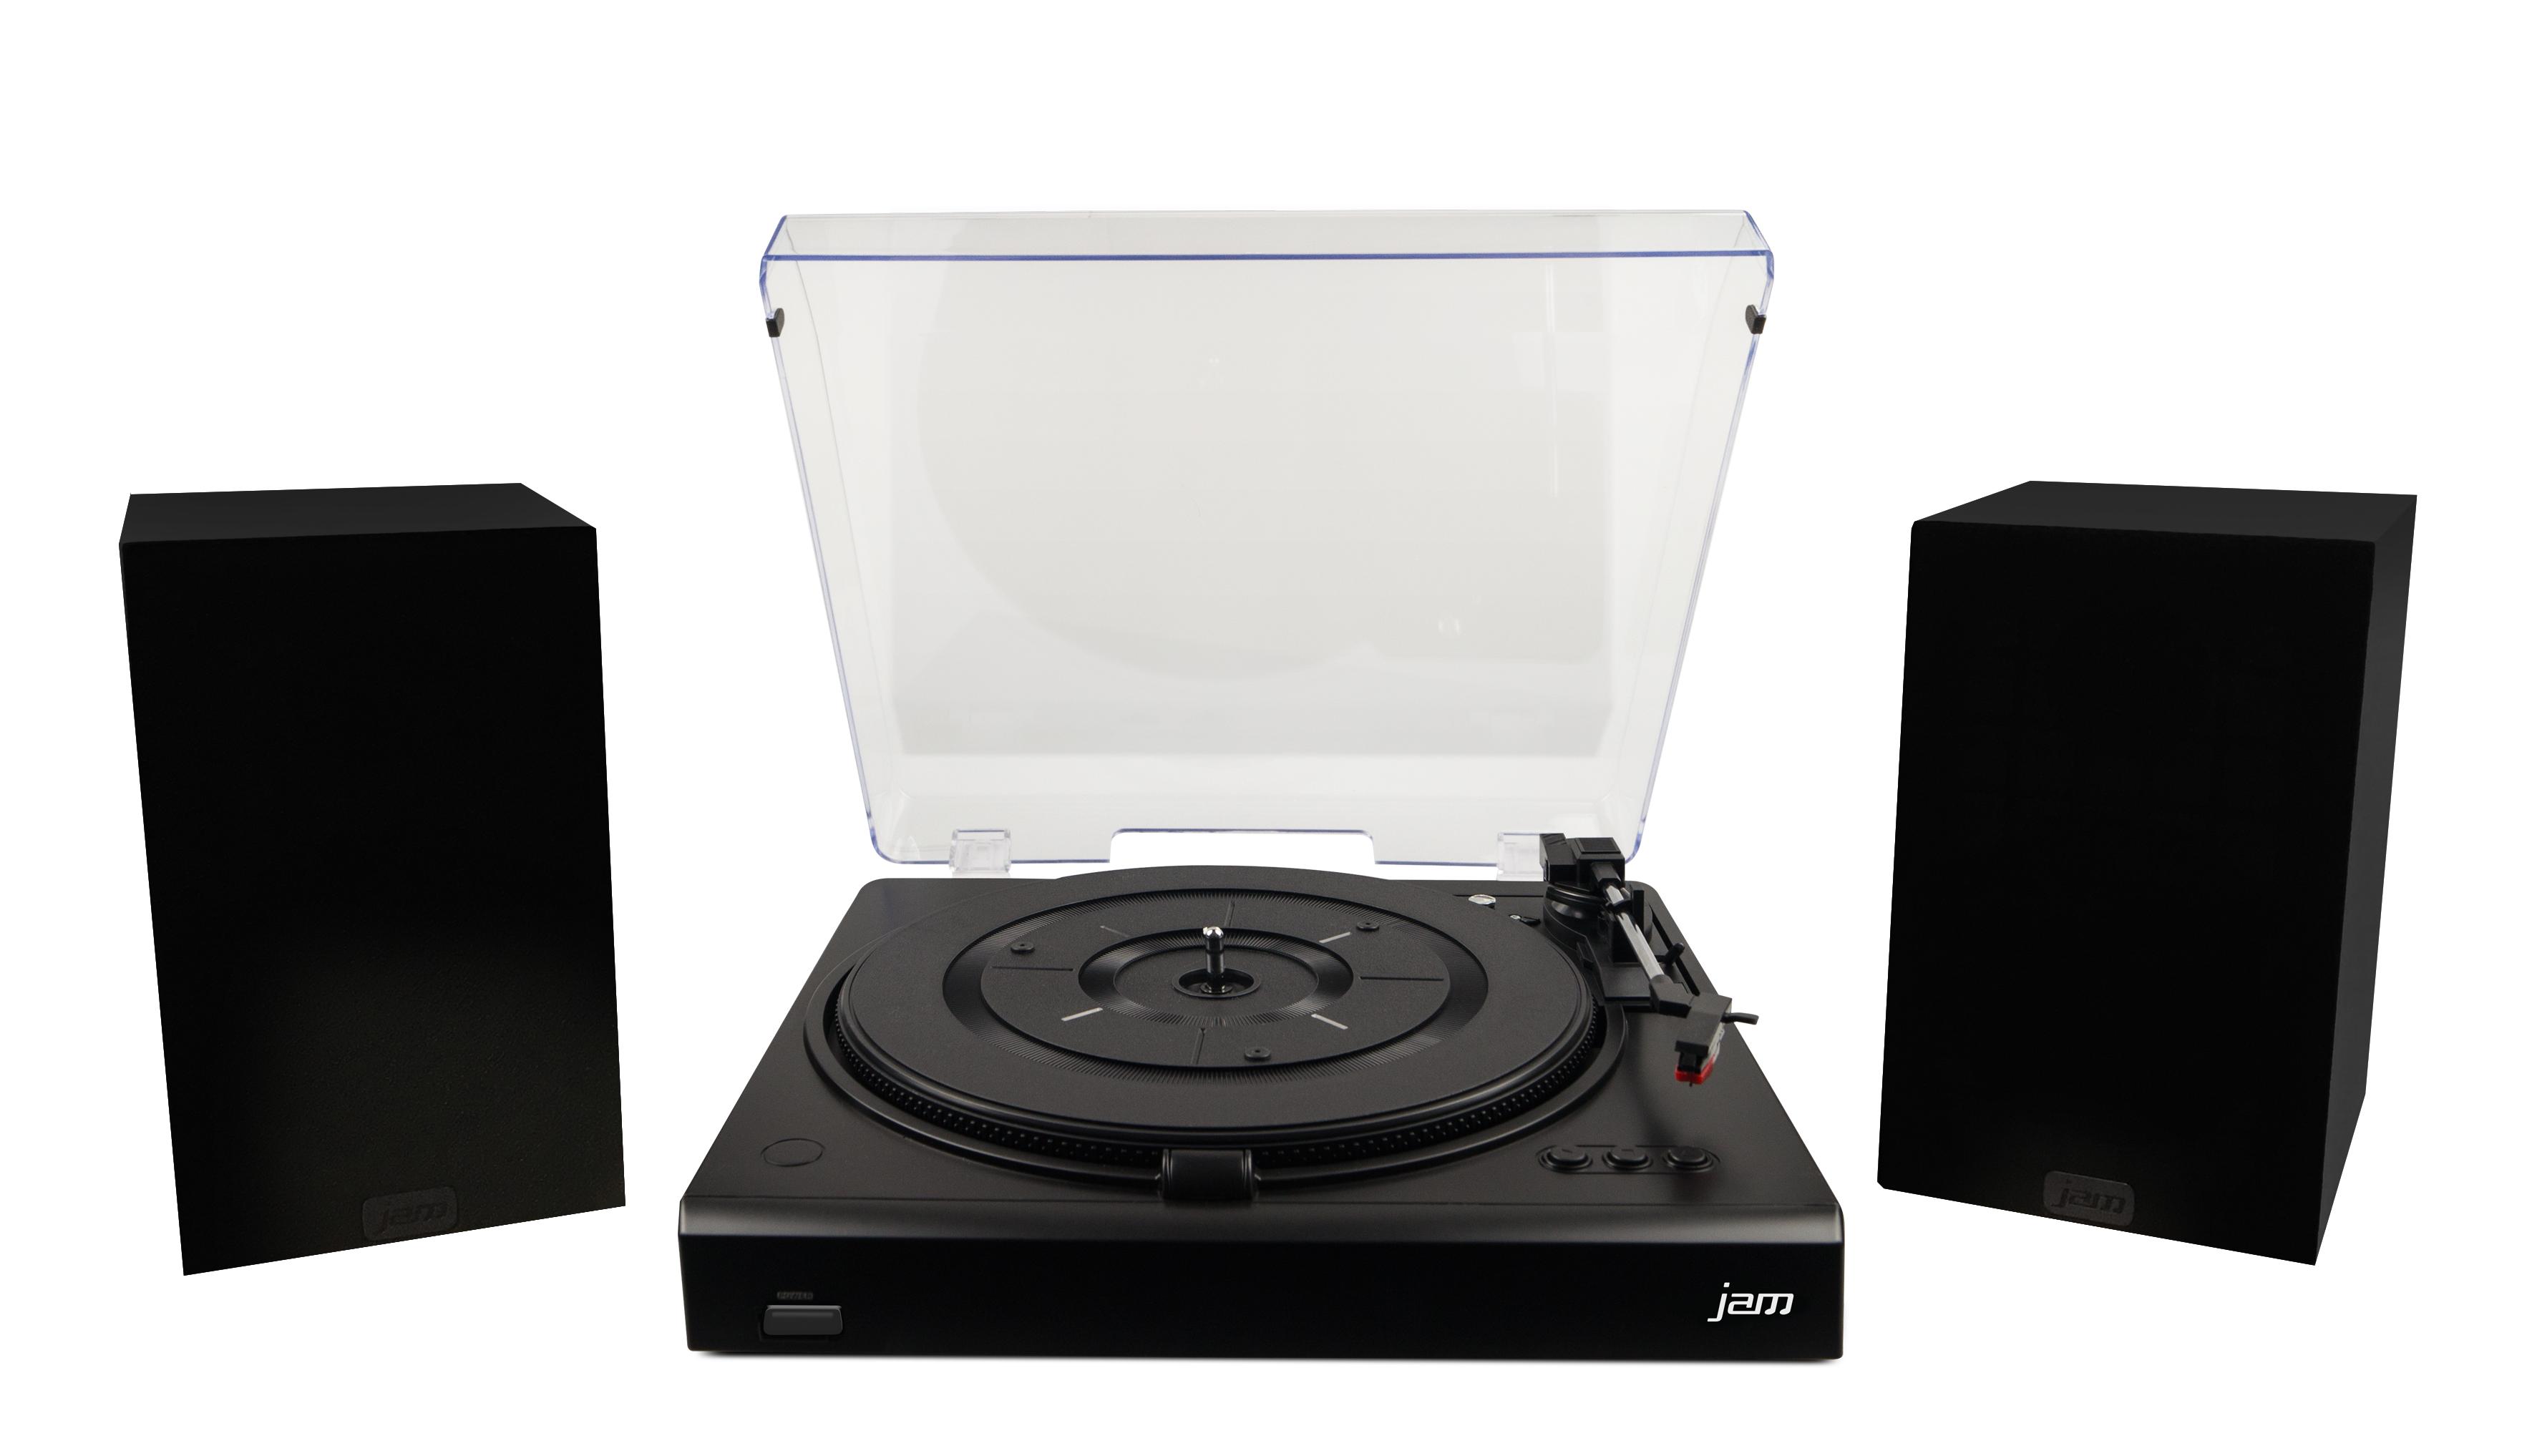 Jam Turntable Amp 32w Stereo Speaker Bundle 3 Speed Record